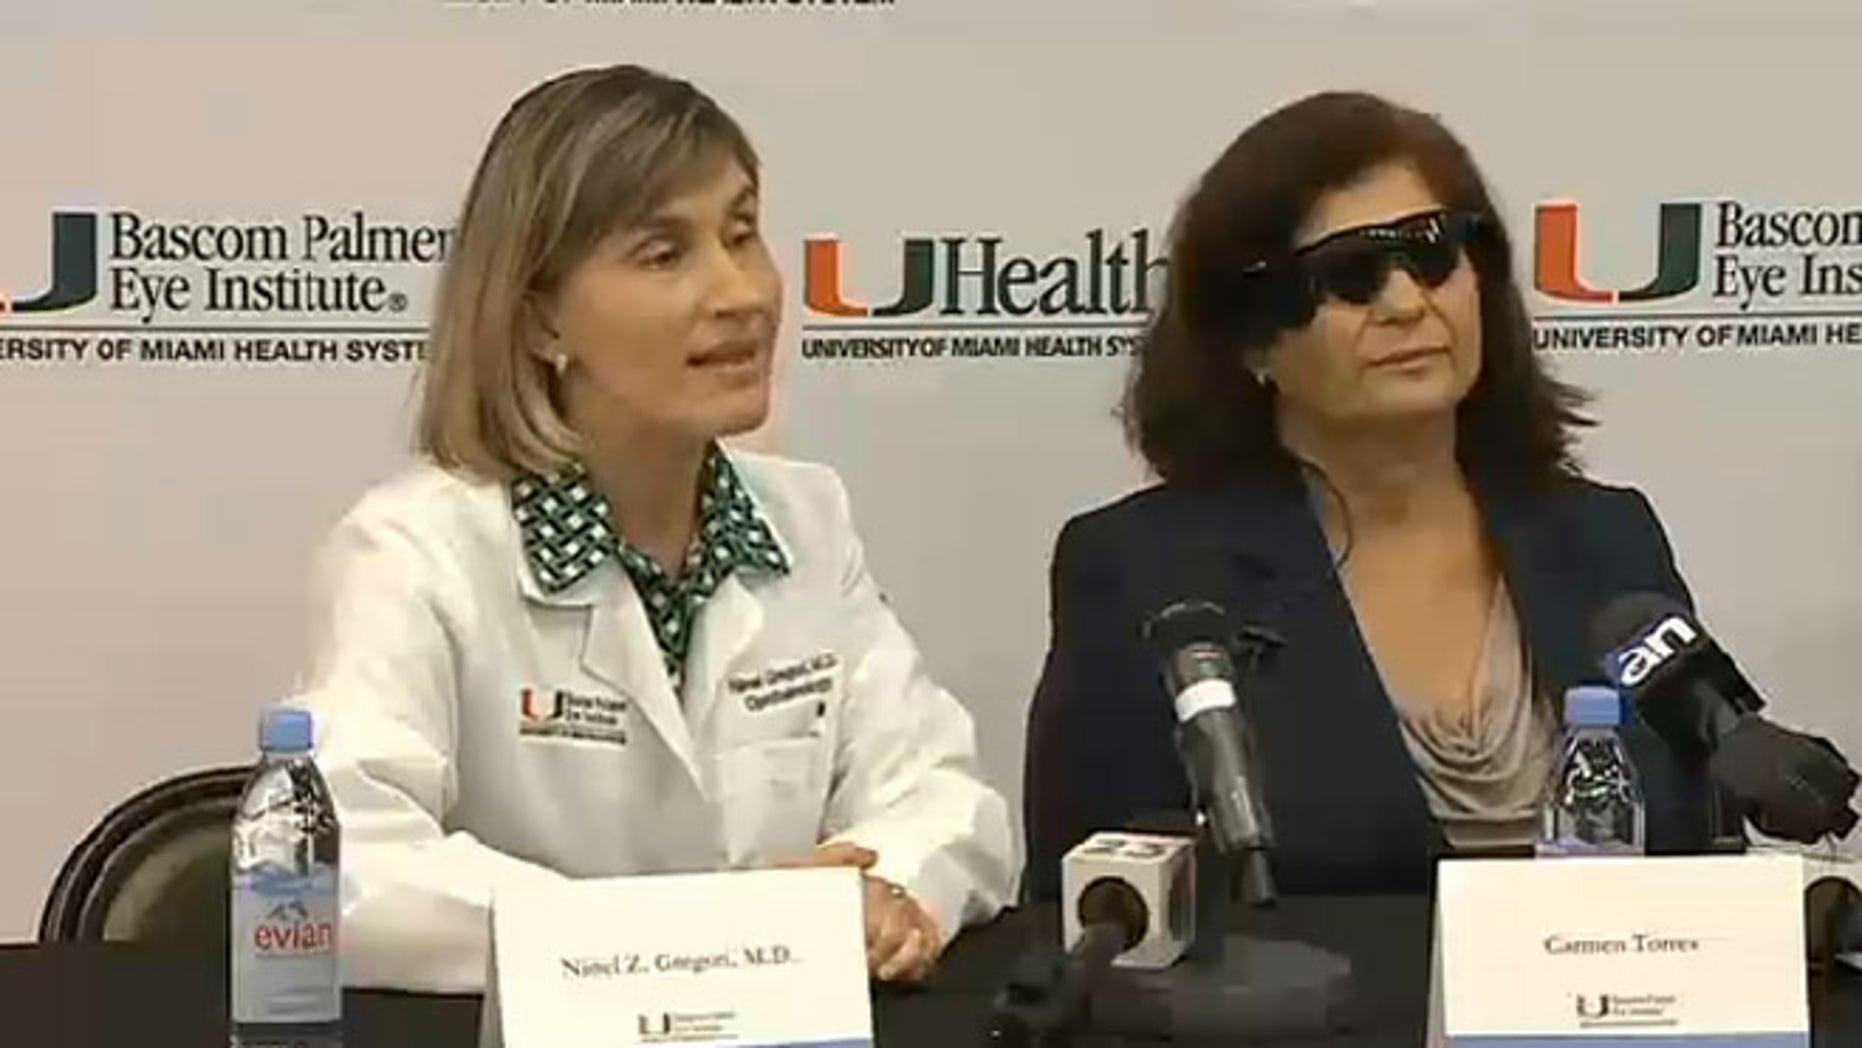 Dr. Ninel Gregori (left) of Bascom Palmer Eye Institue with patient Carmen Torres (right).